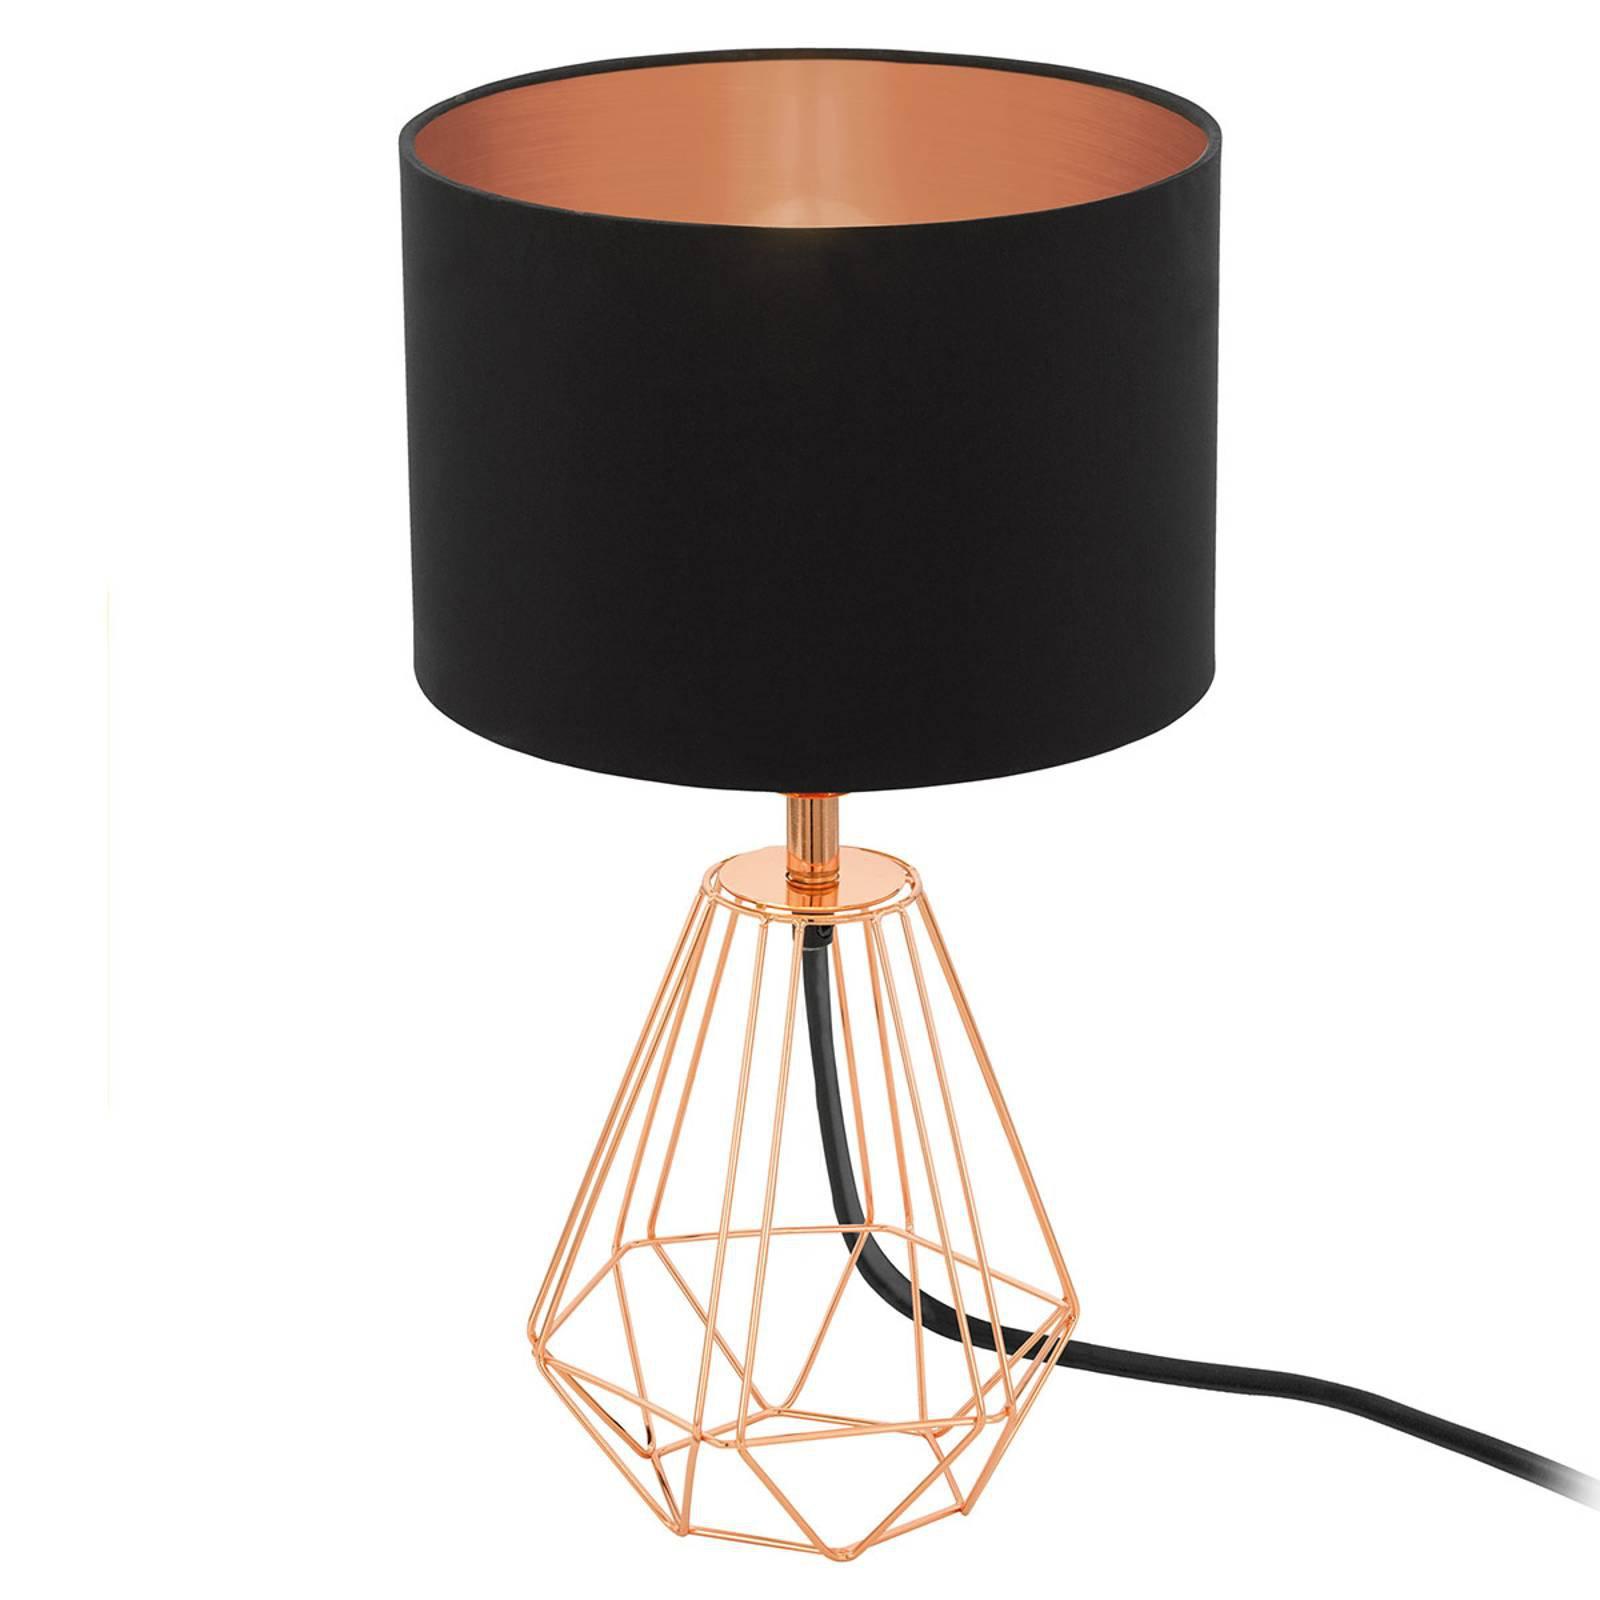 Bordlampe Carlton 2, svart-kobber